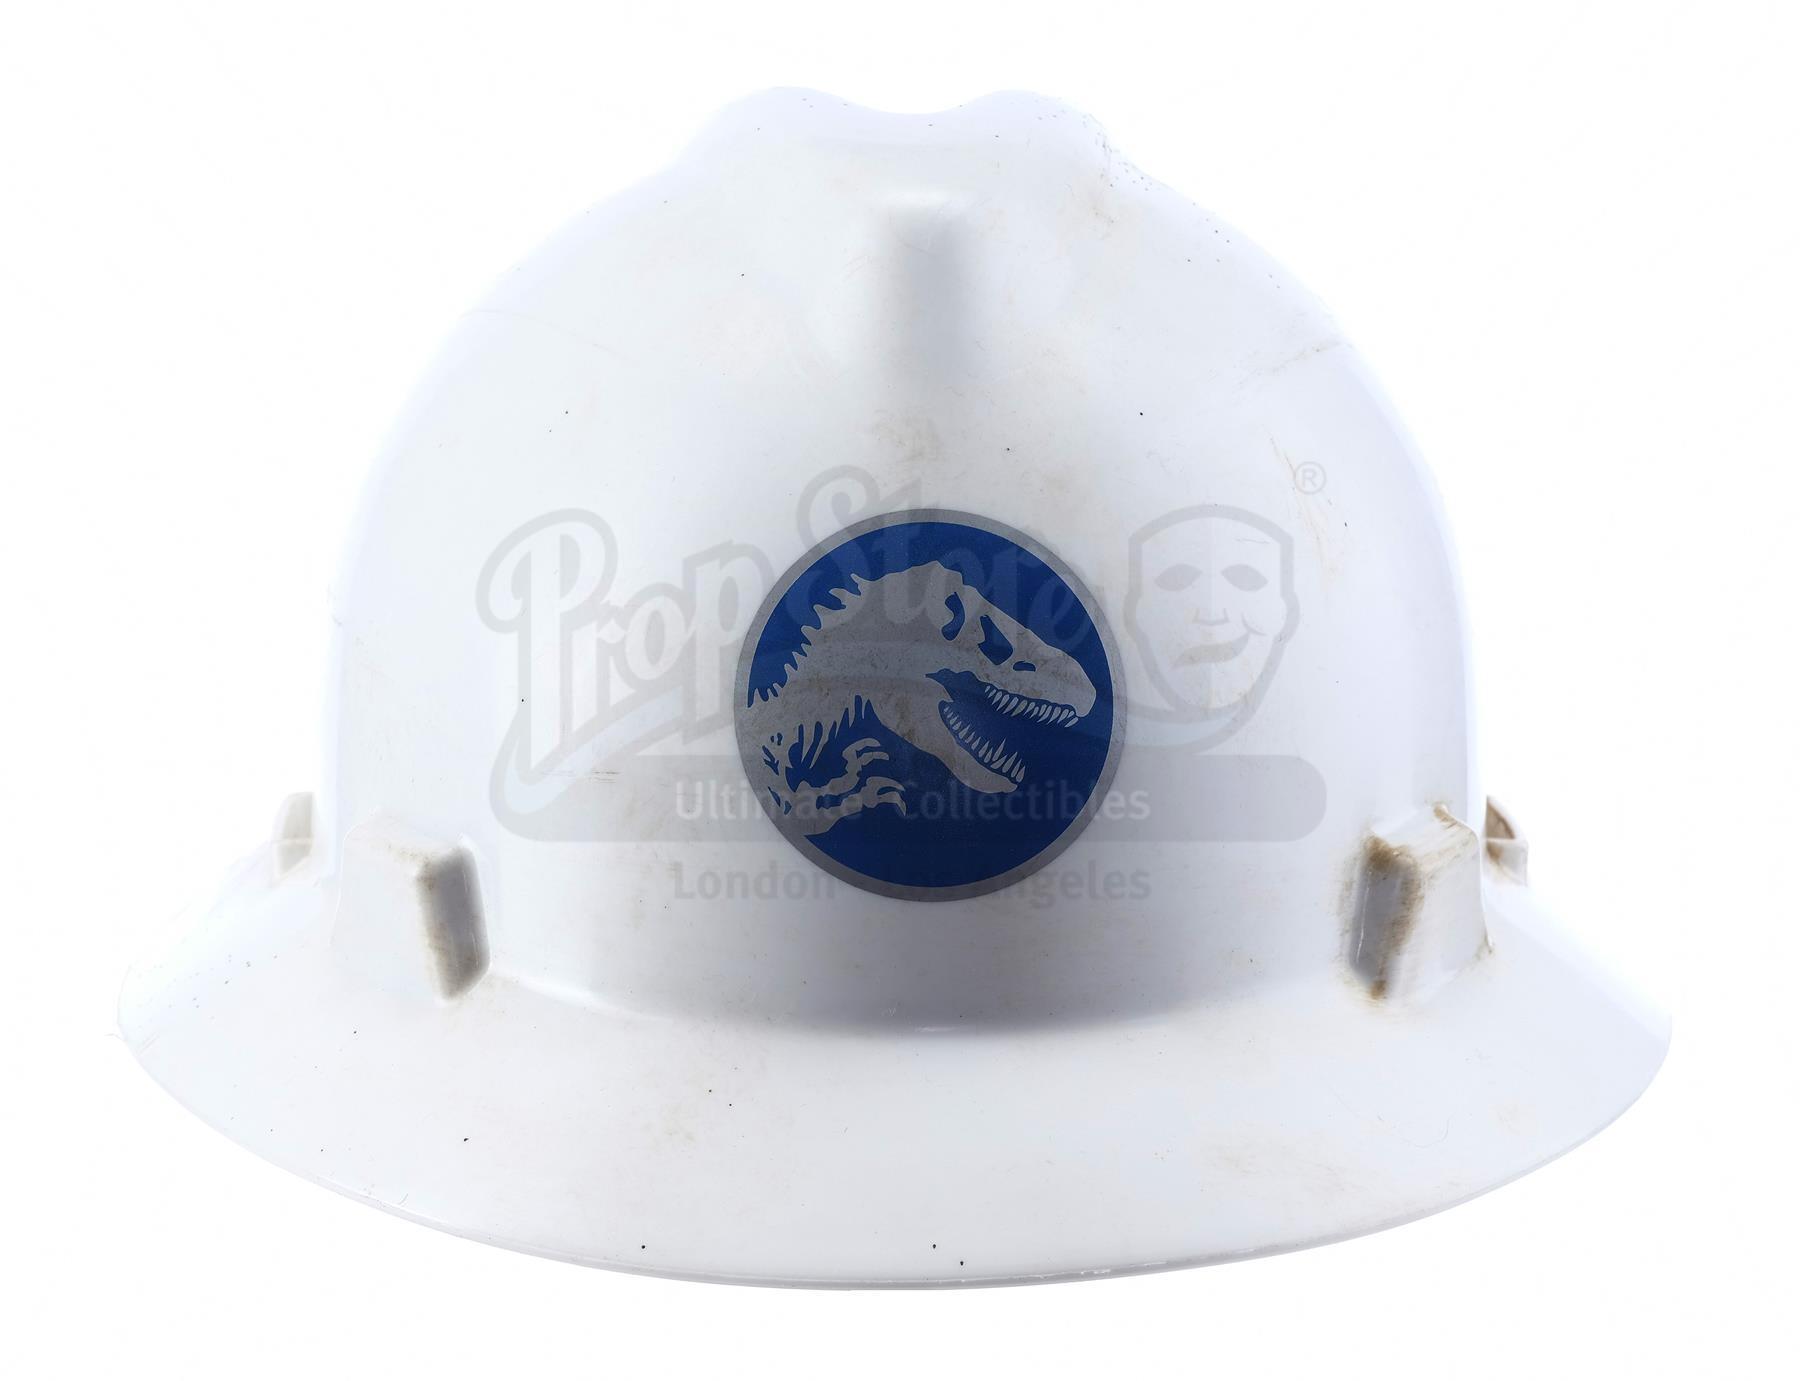 Lot # 812: JURASSIC WORLD - Jurassic World Employee Hard Hat